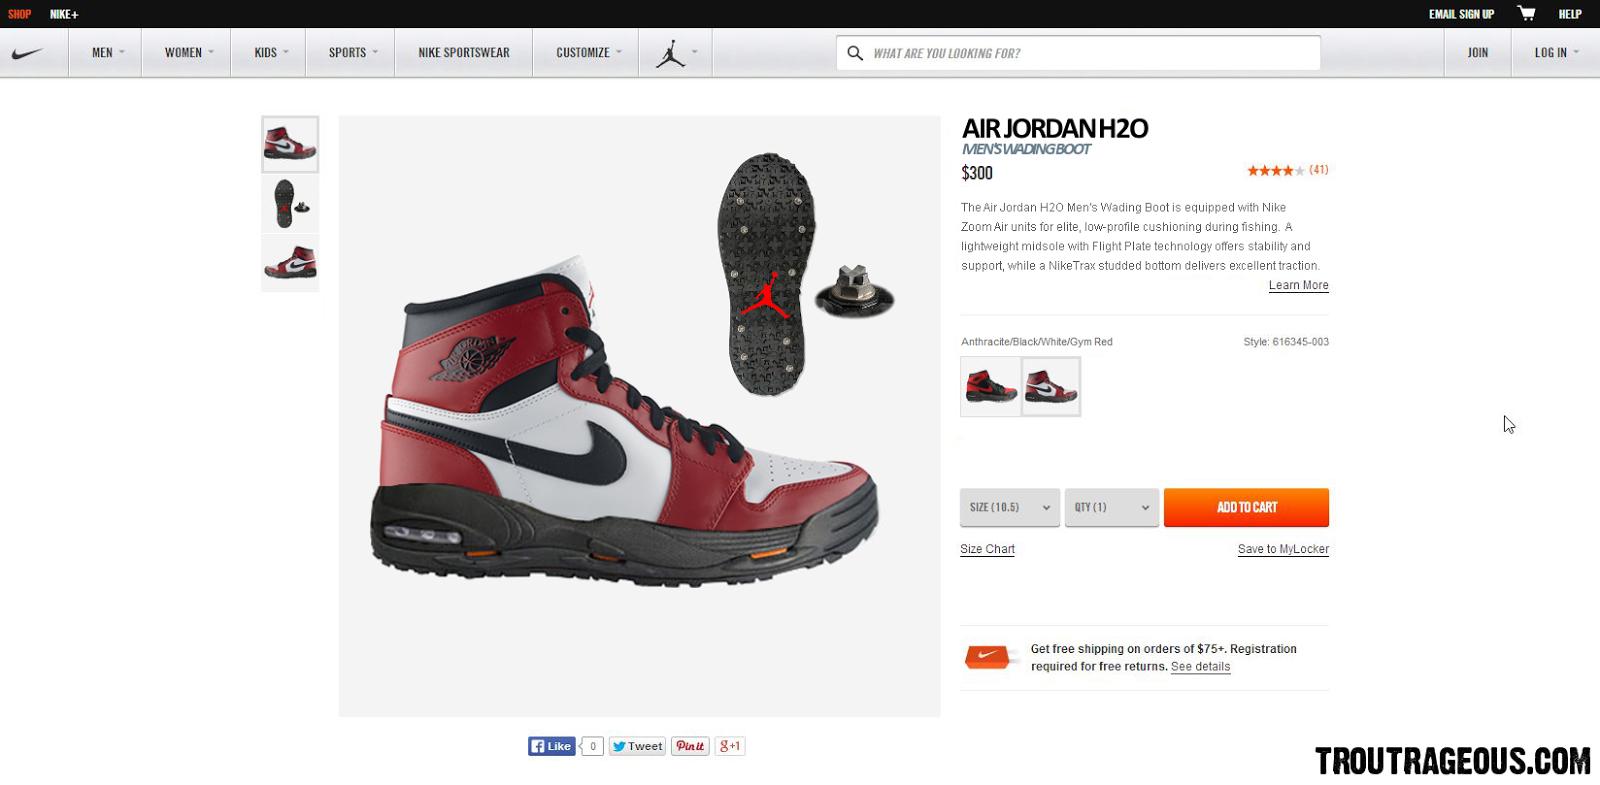 Nike Air Jordan H2O Wading Boot Nike.com Product Page